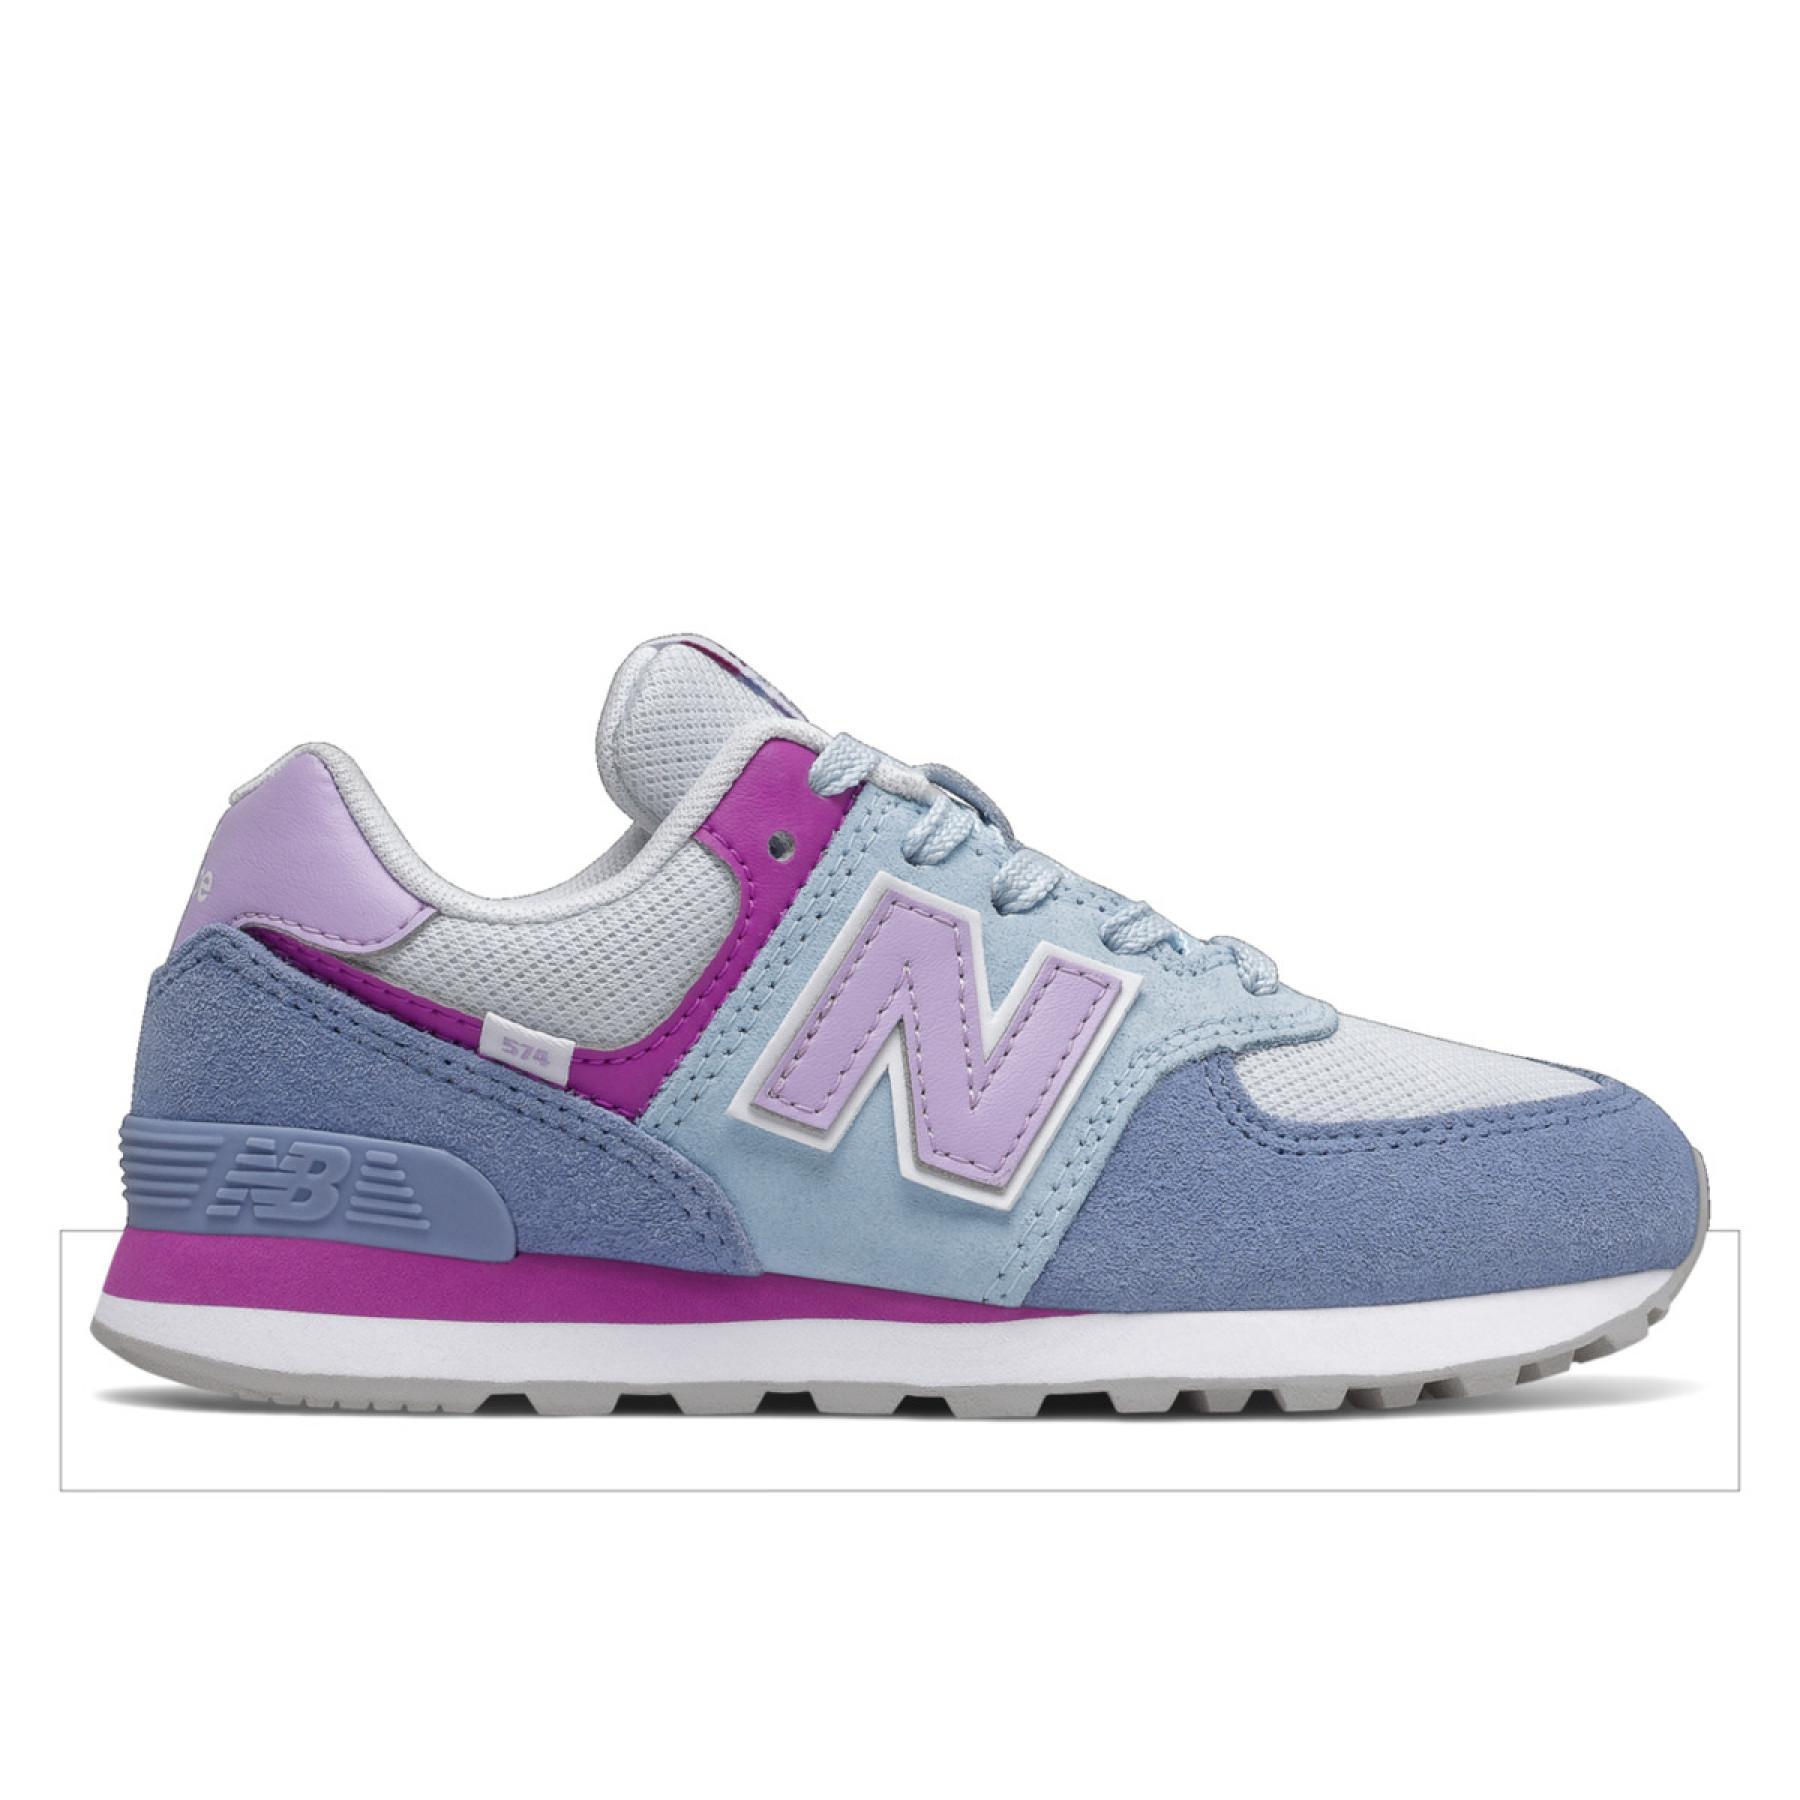 Scarpe per bambini New Balance 574